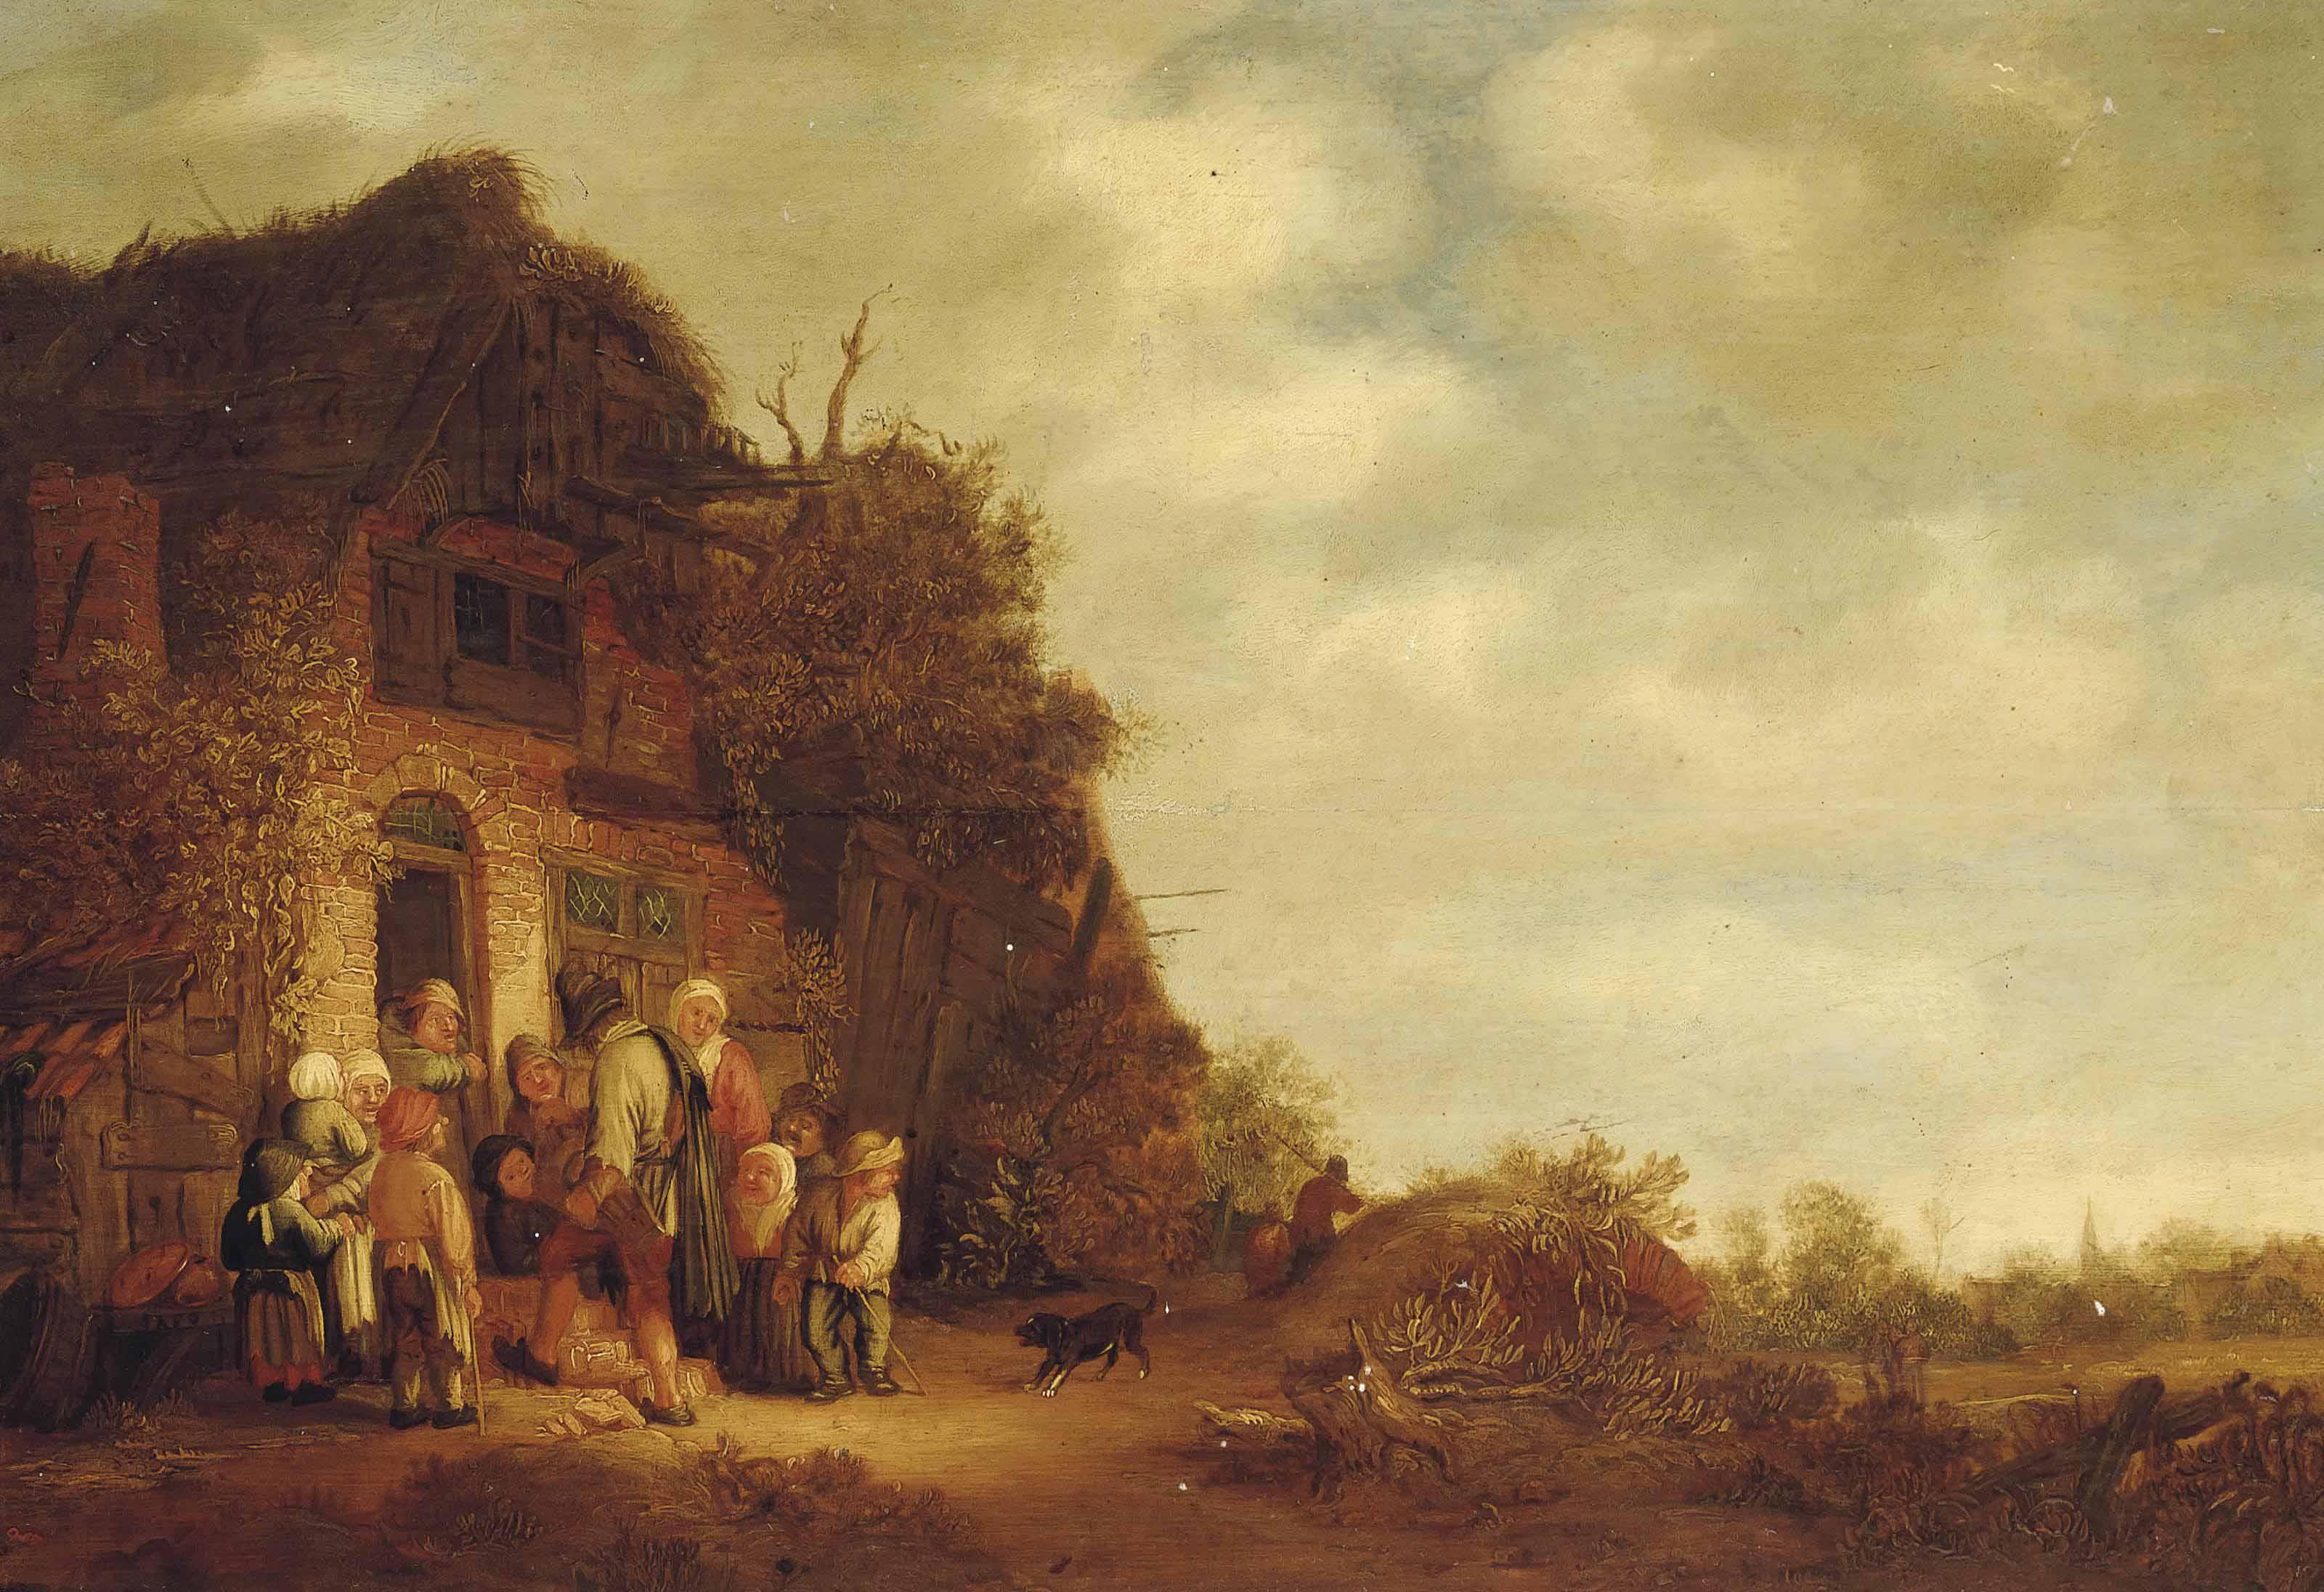 Circle of Isaac van Ostade (Ha